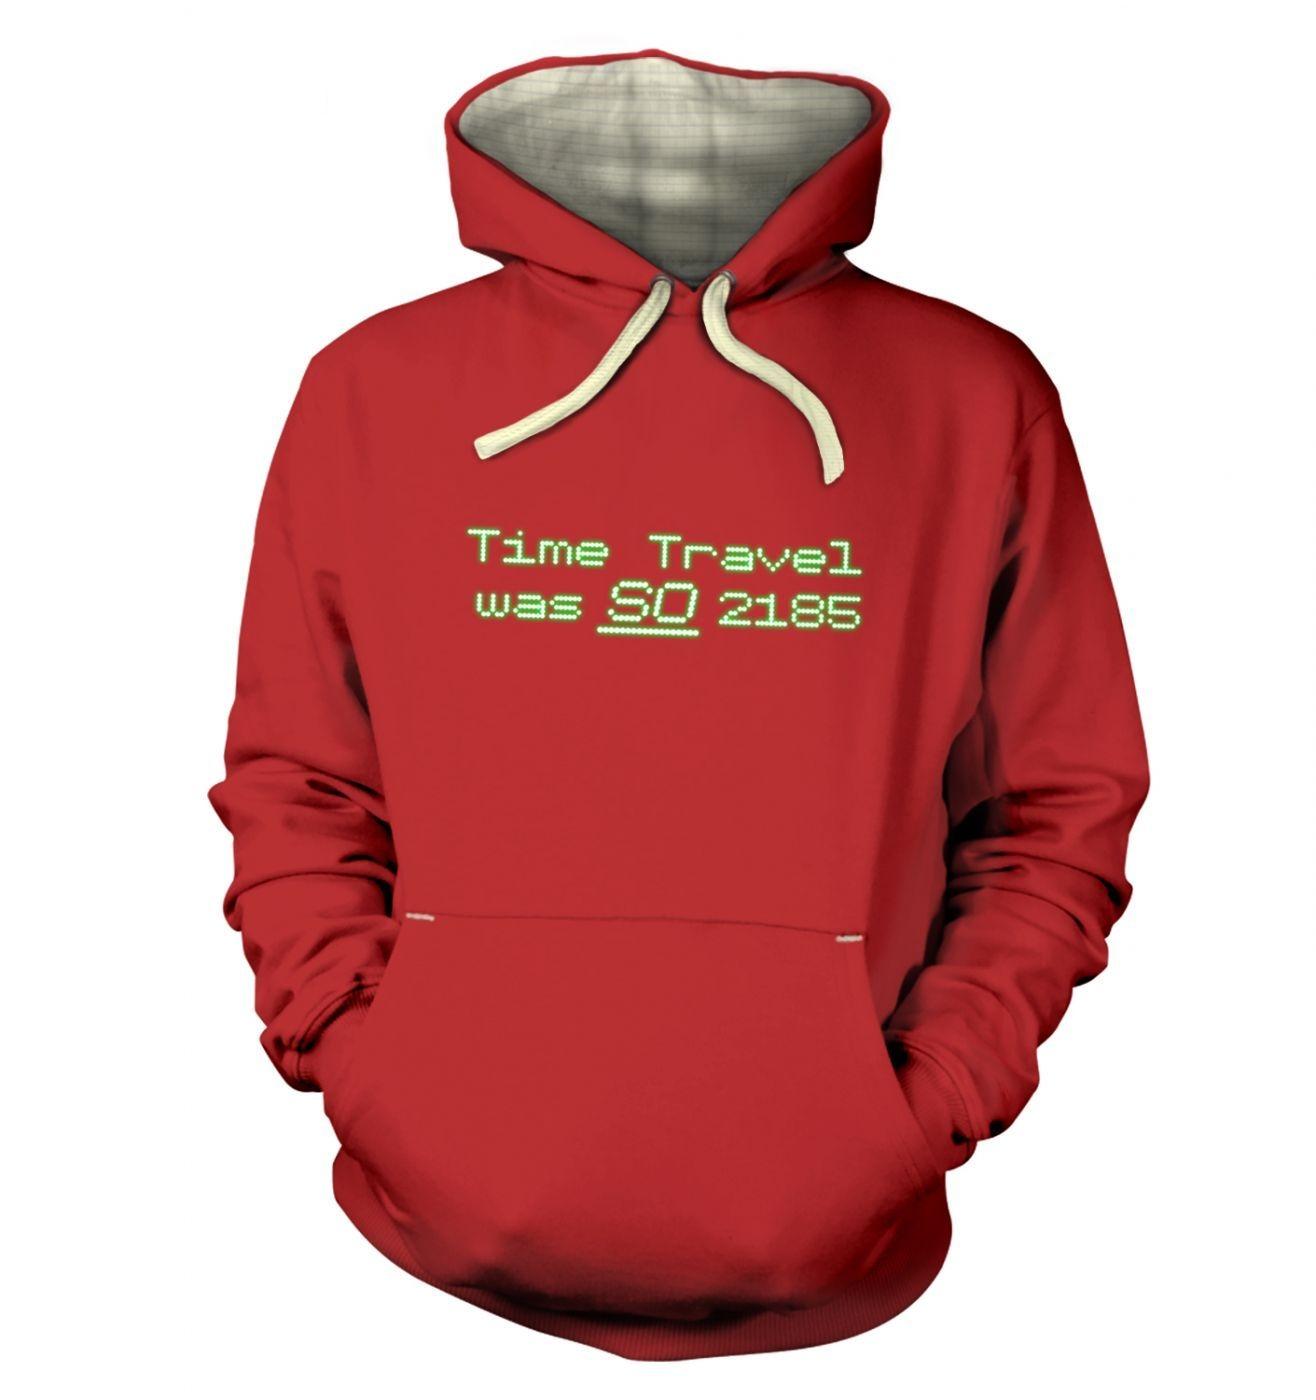 Time Travel Was So 2185 hoodie (premium)